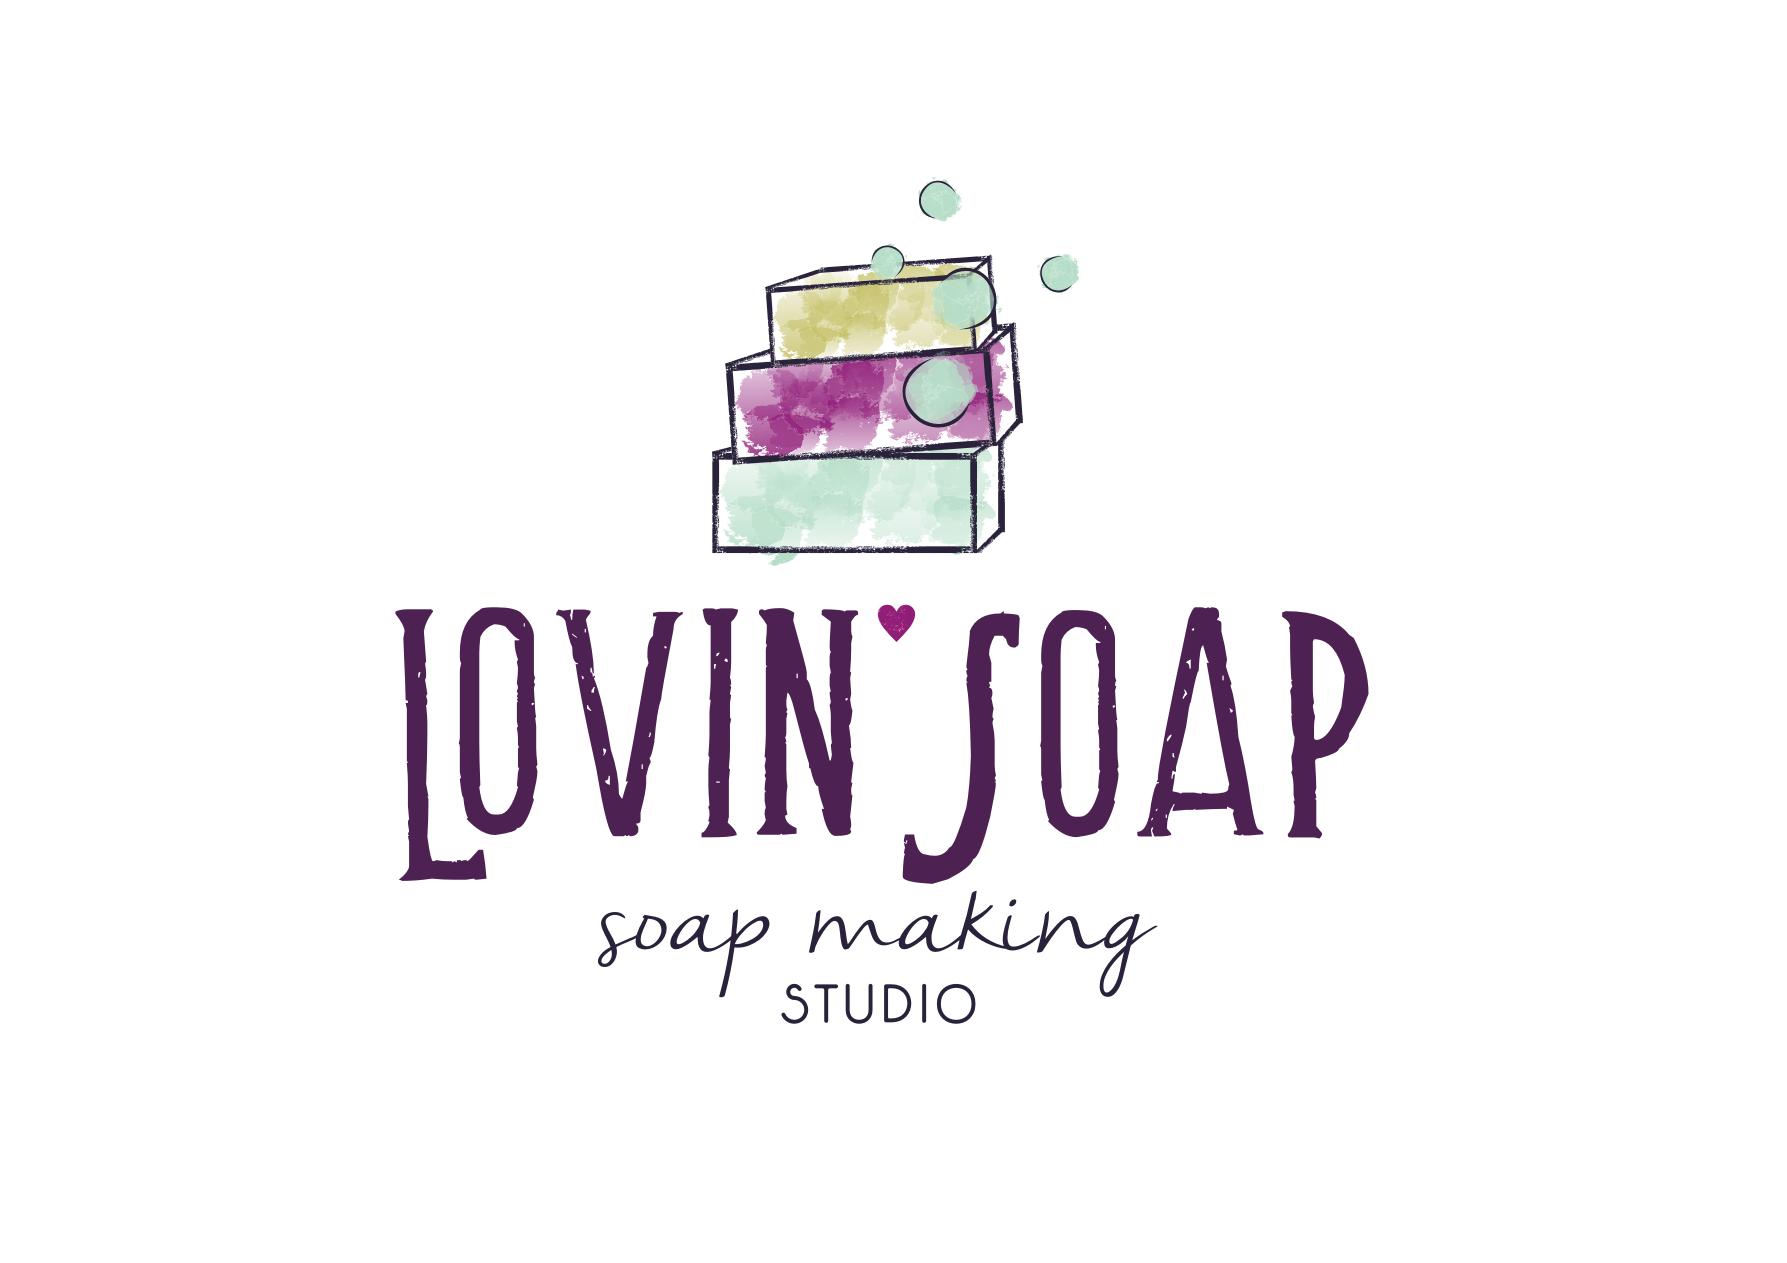 Create an artsy/craftsy logo for soap making studio!